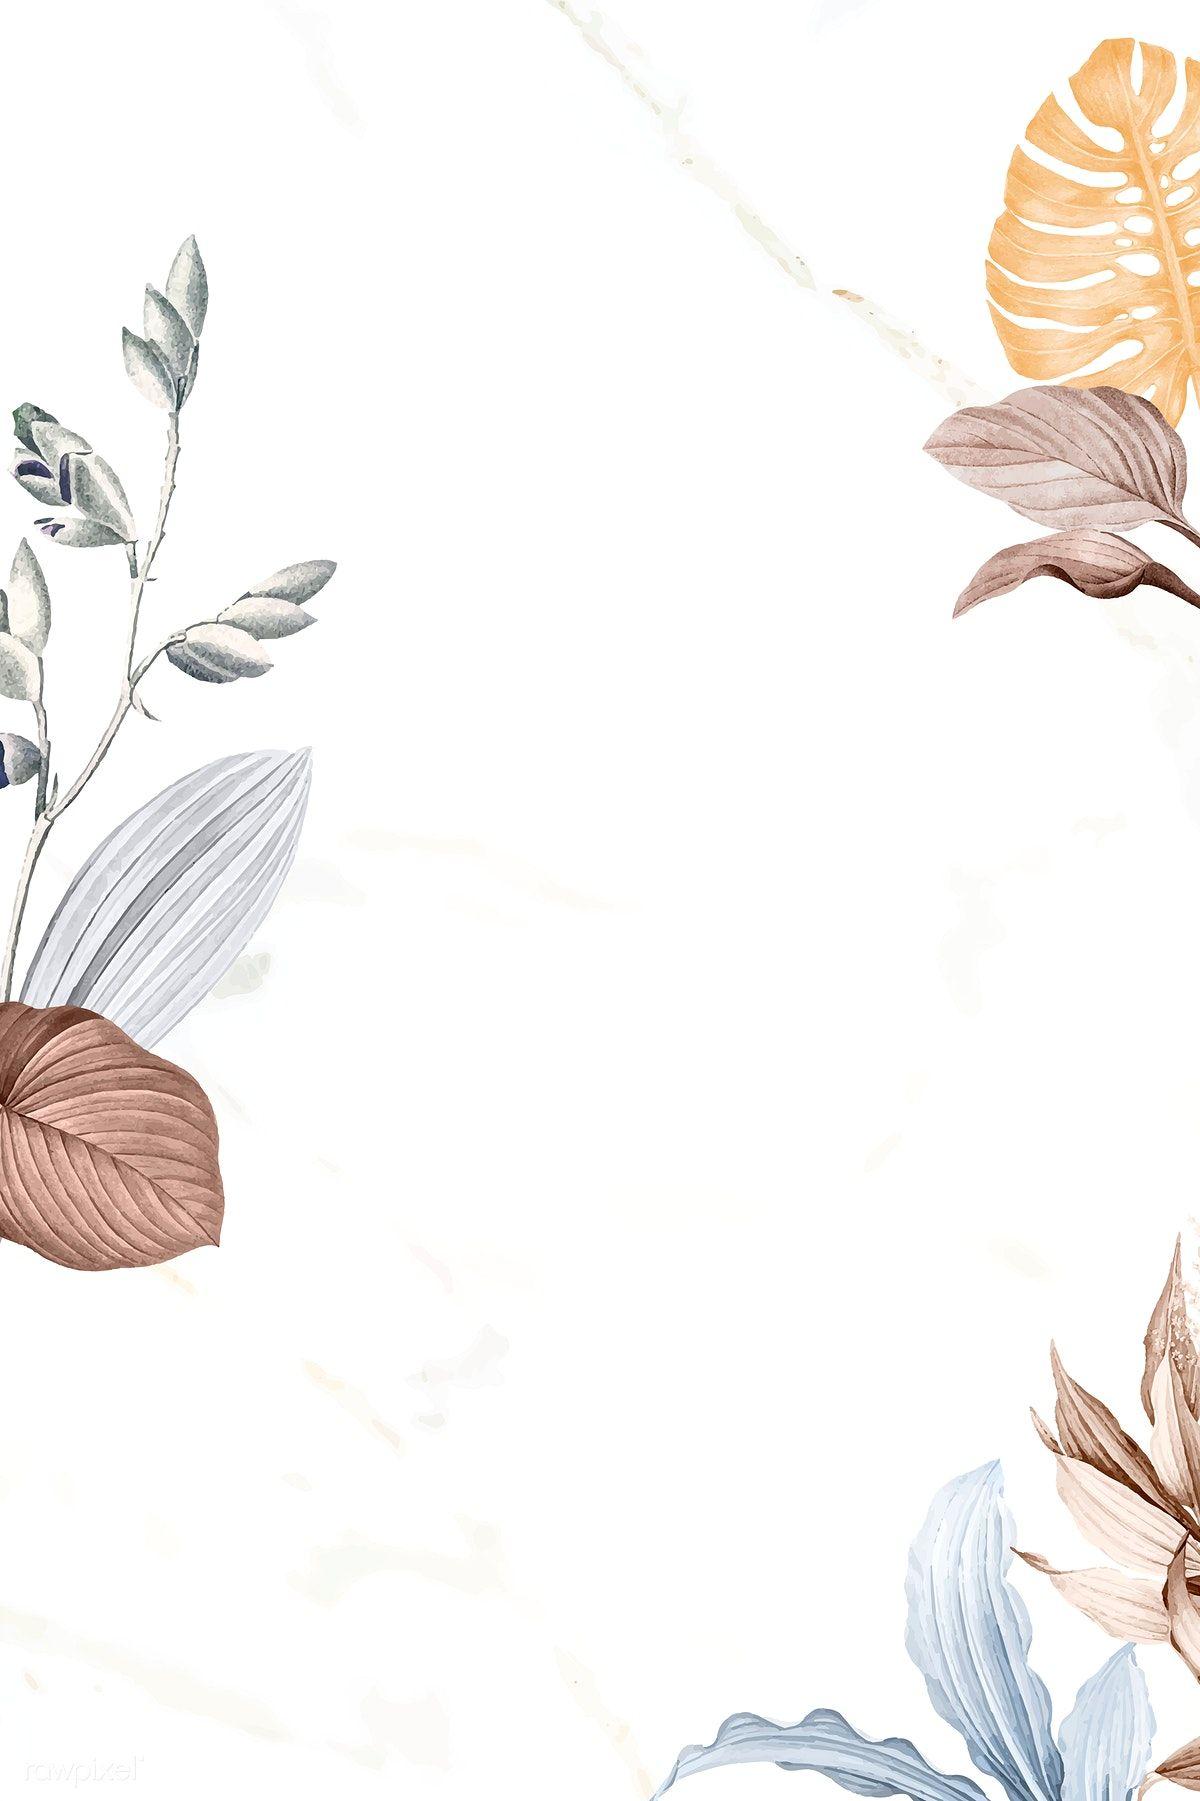 Tropical leafy frame design vector | premium image by rawpixel.com / sasi #vector #vectoart #digitalpainting #digitalartist #garphicdesign #sketch #digitaldrawing #doodle #illustrator #digitalillustration #modernart #leaves #tropical